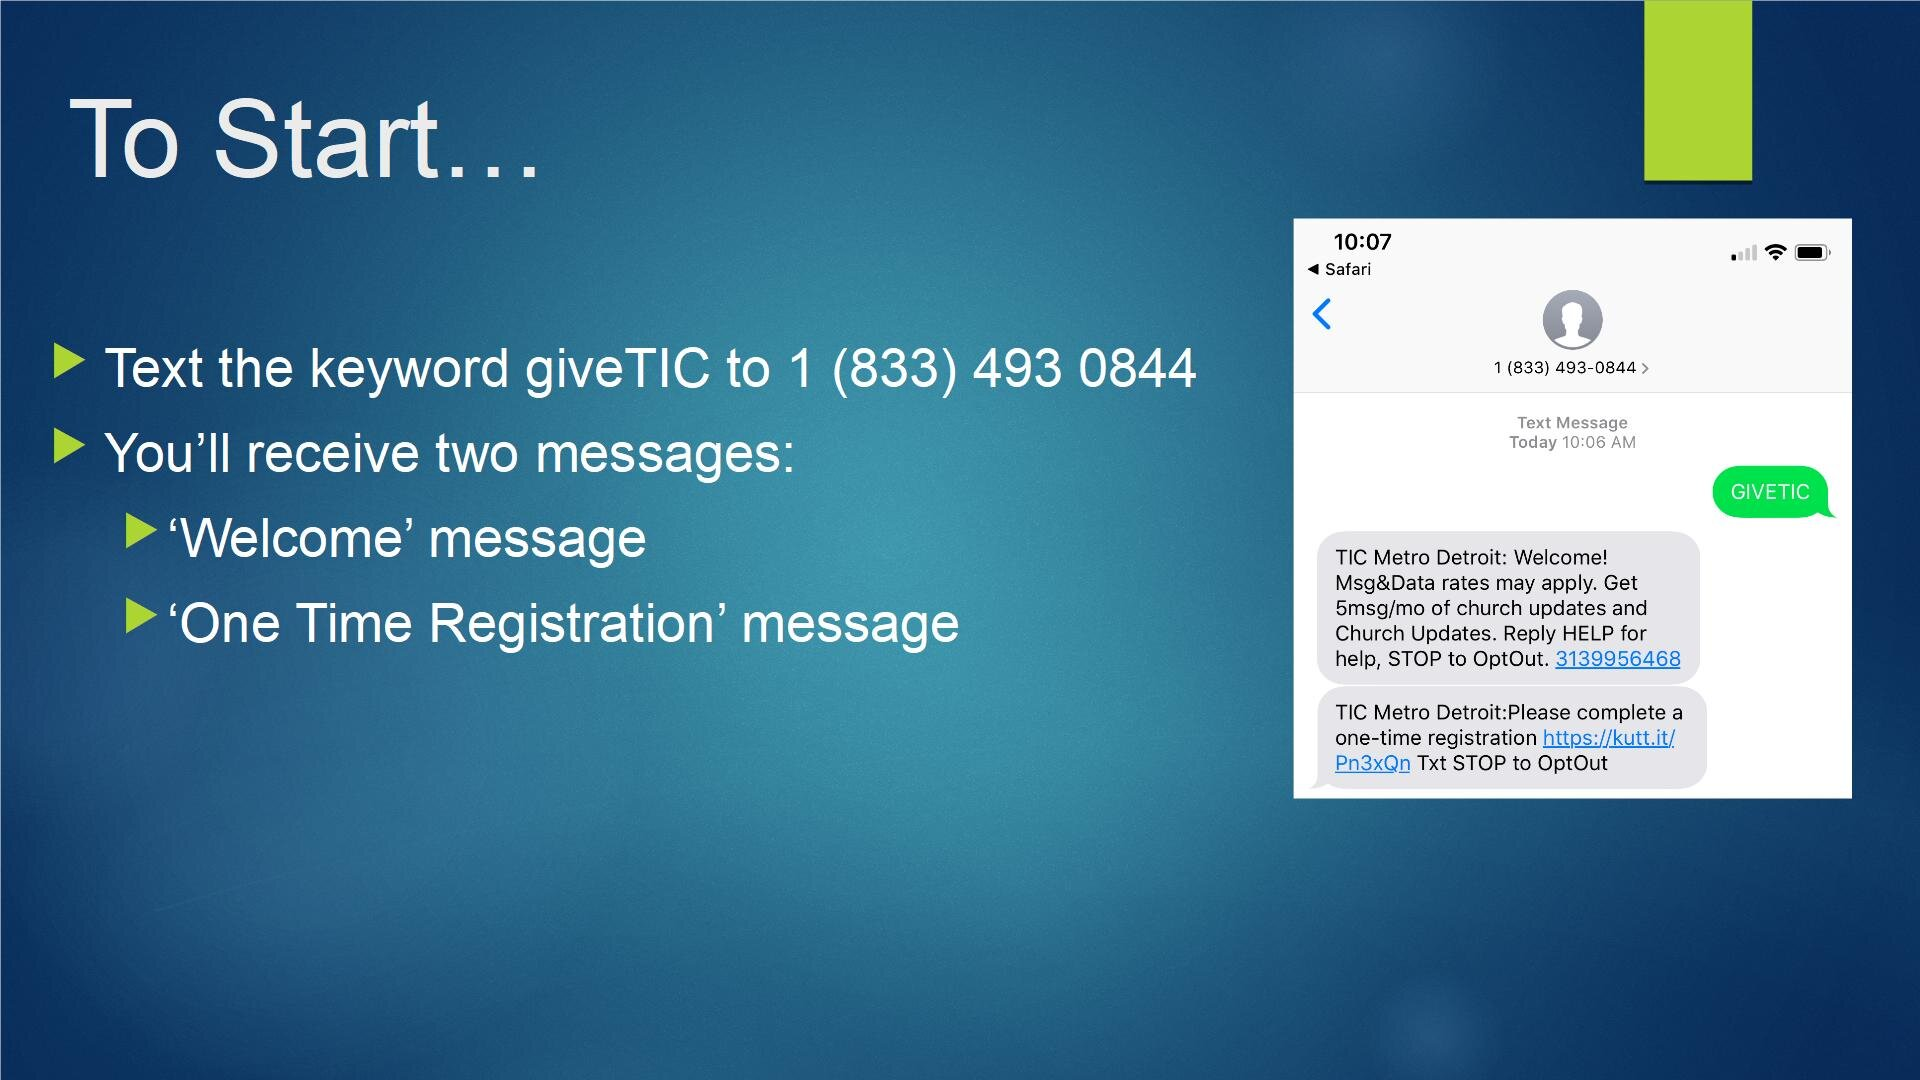 TIC Metro Detroit Text Slides.jpg